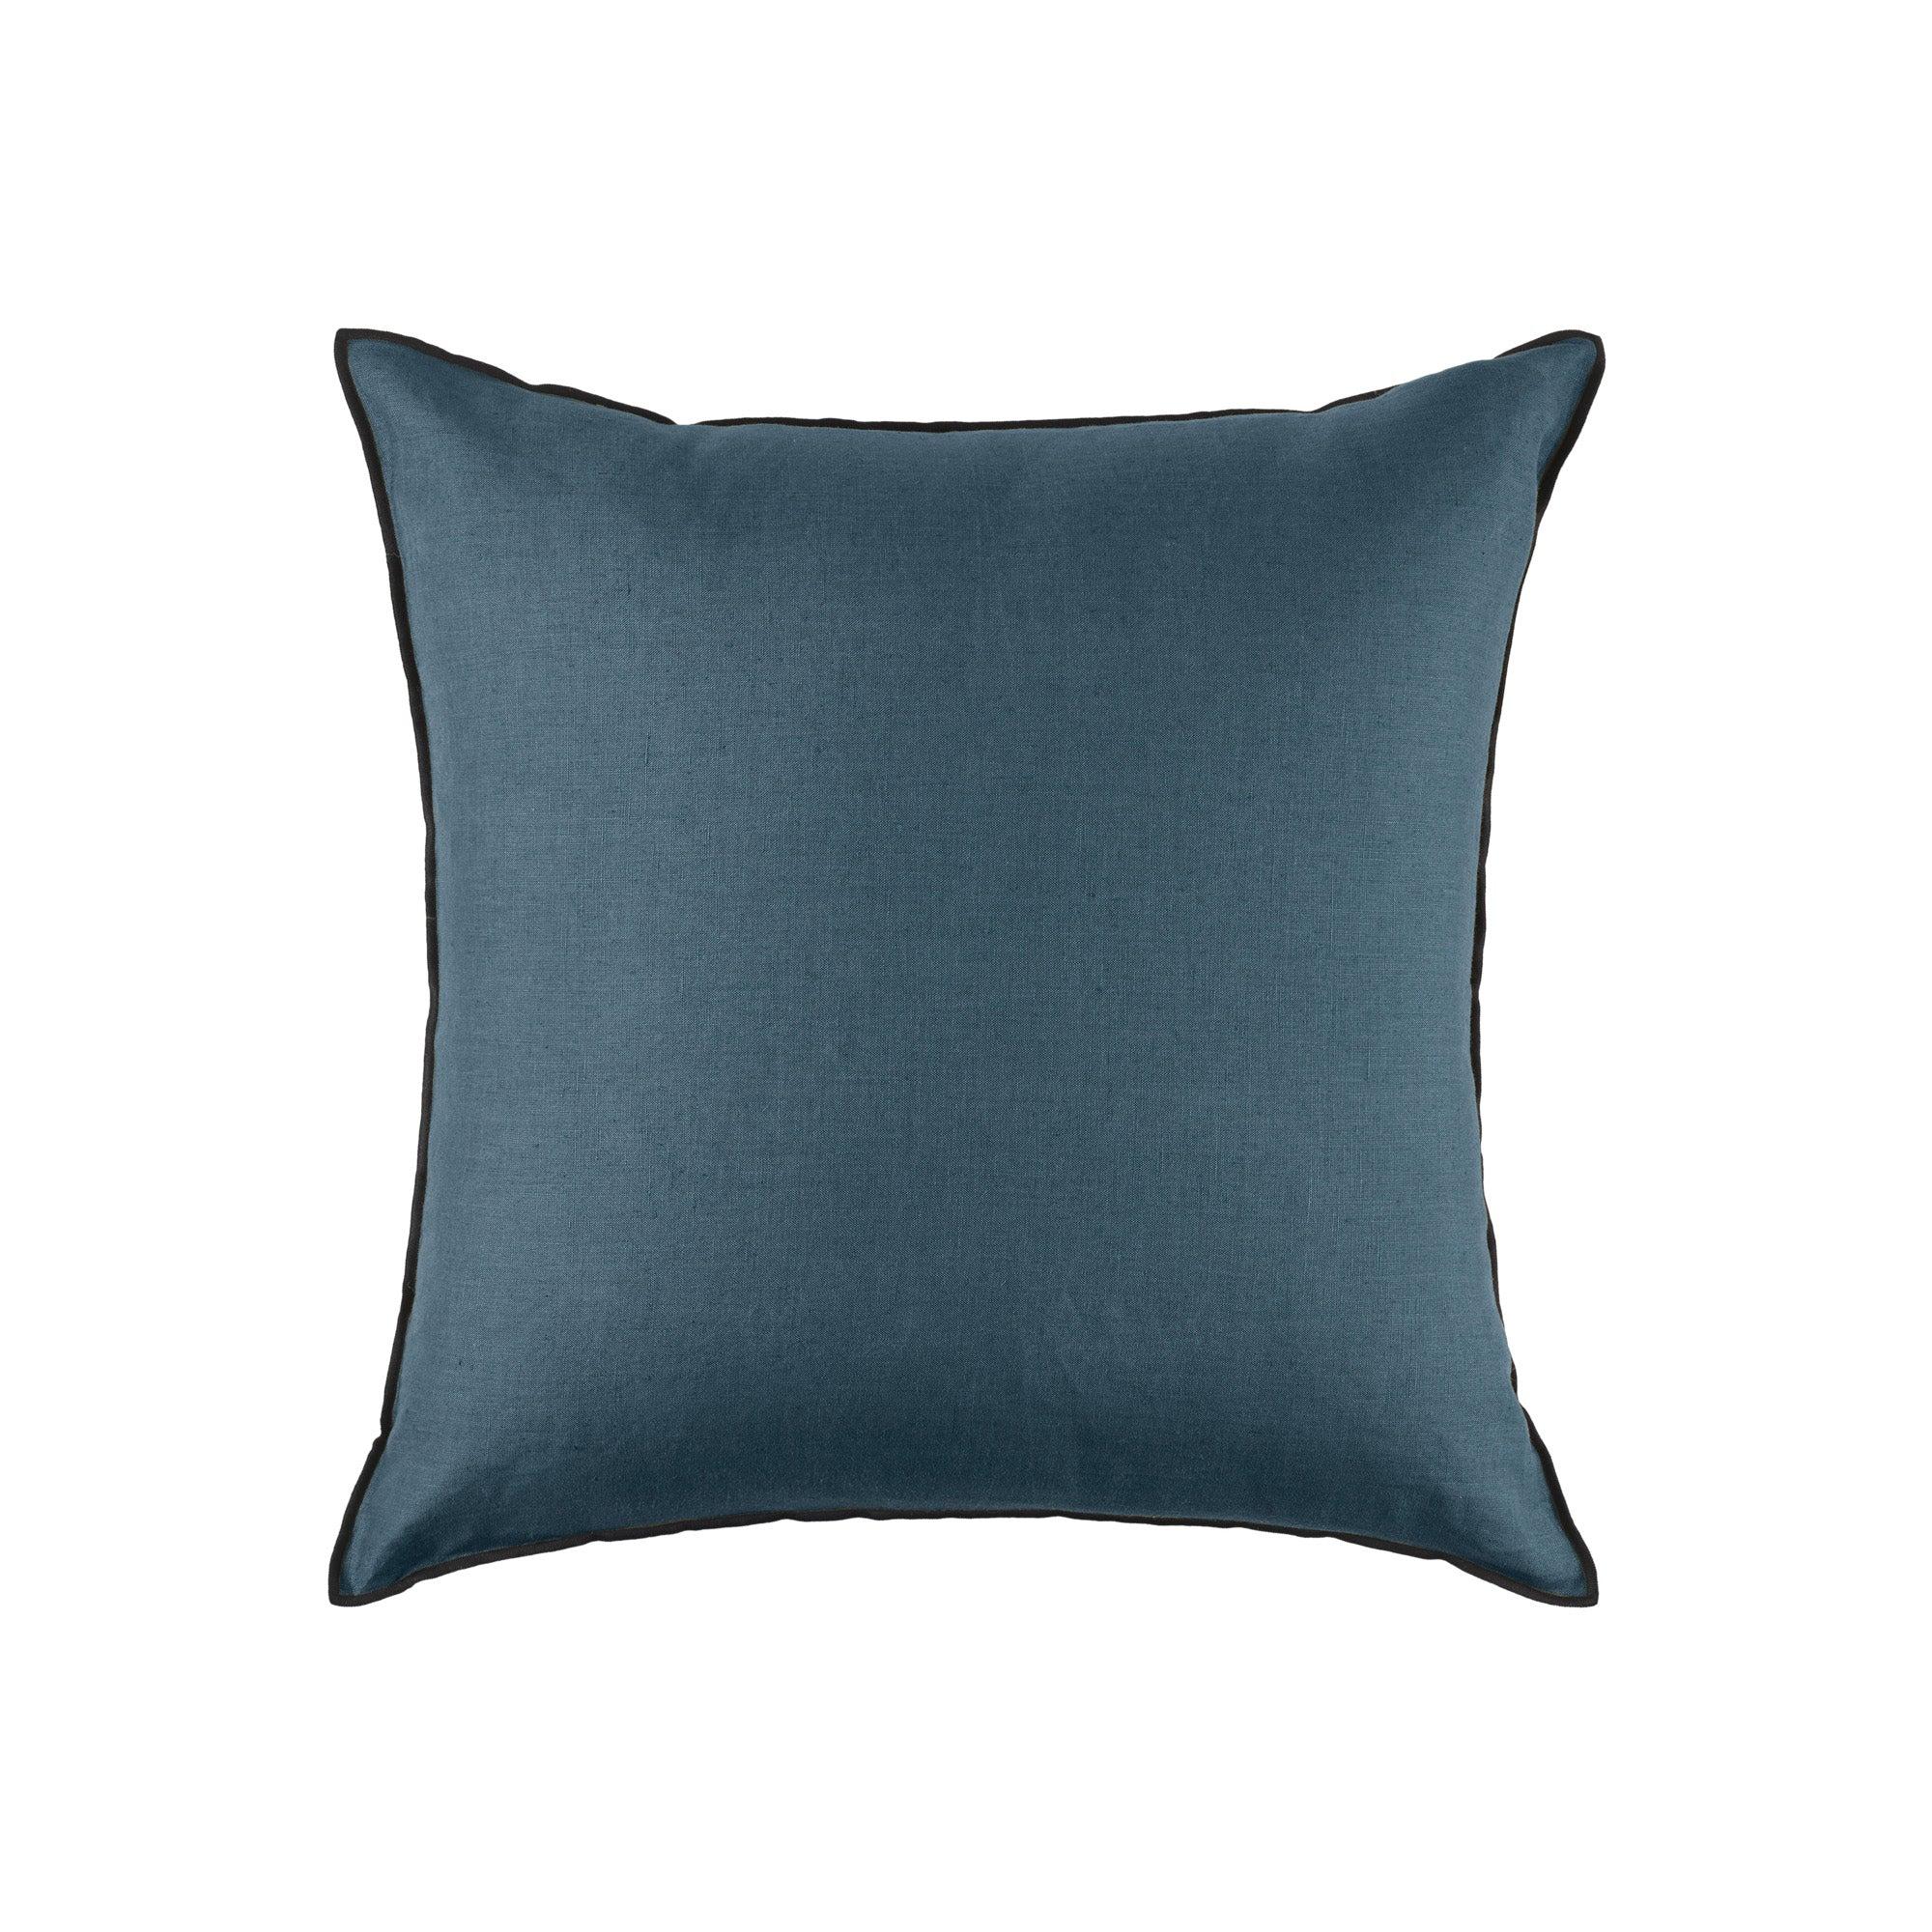 Housse de coussin 50x50 cm Bleu vert et bourdon noir en Lin CARLINA